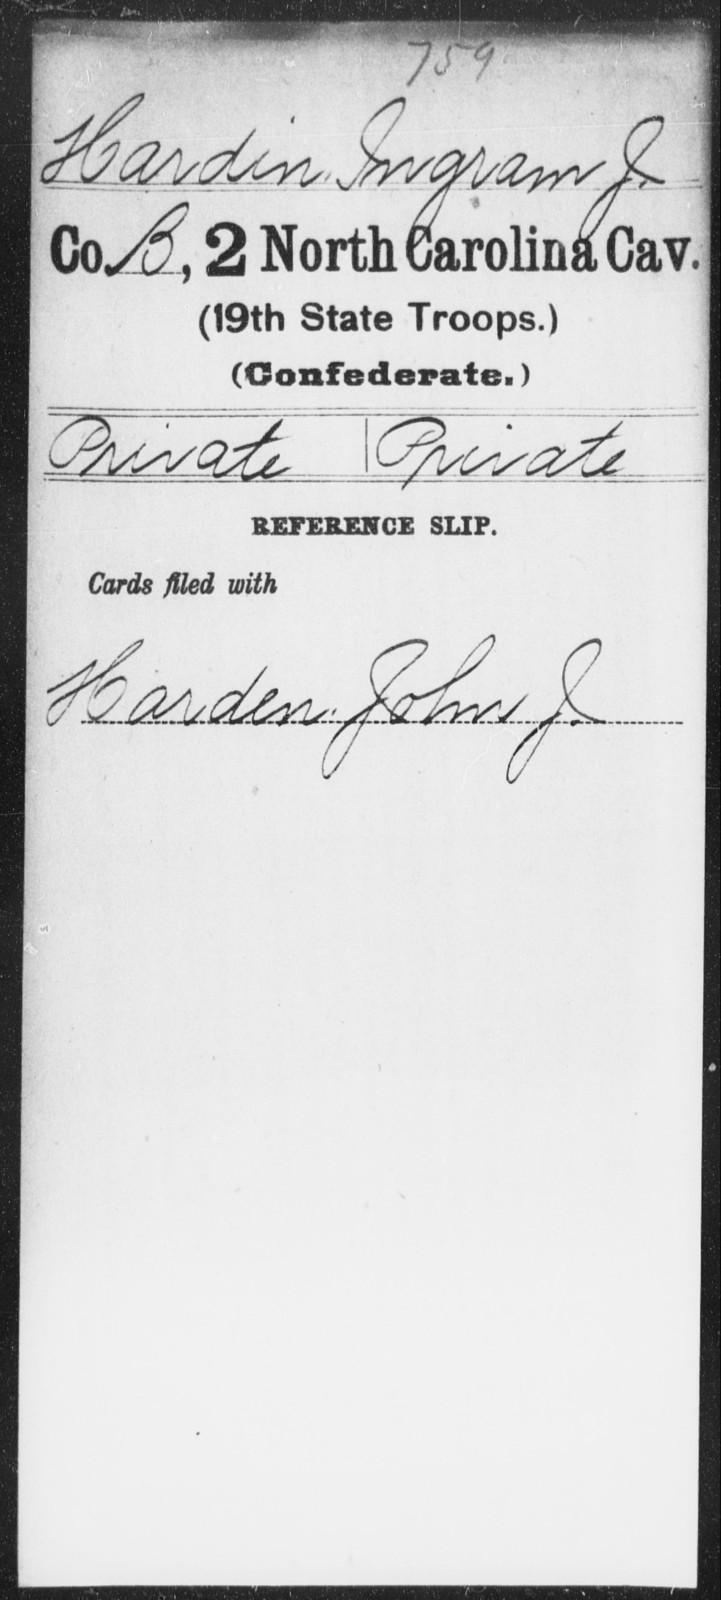 Hardin, Ingram J - Second Cavalry (19th State Troops)